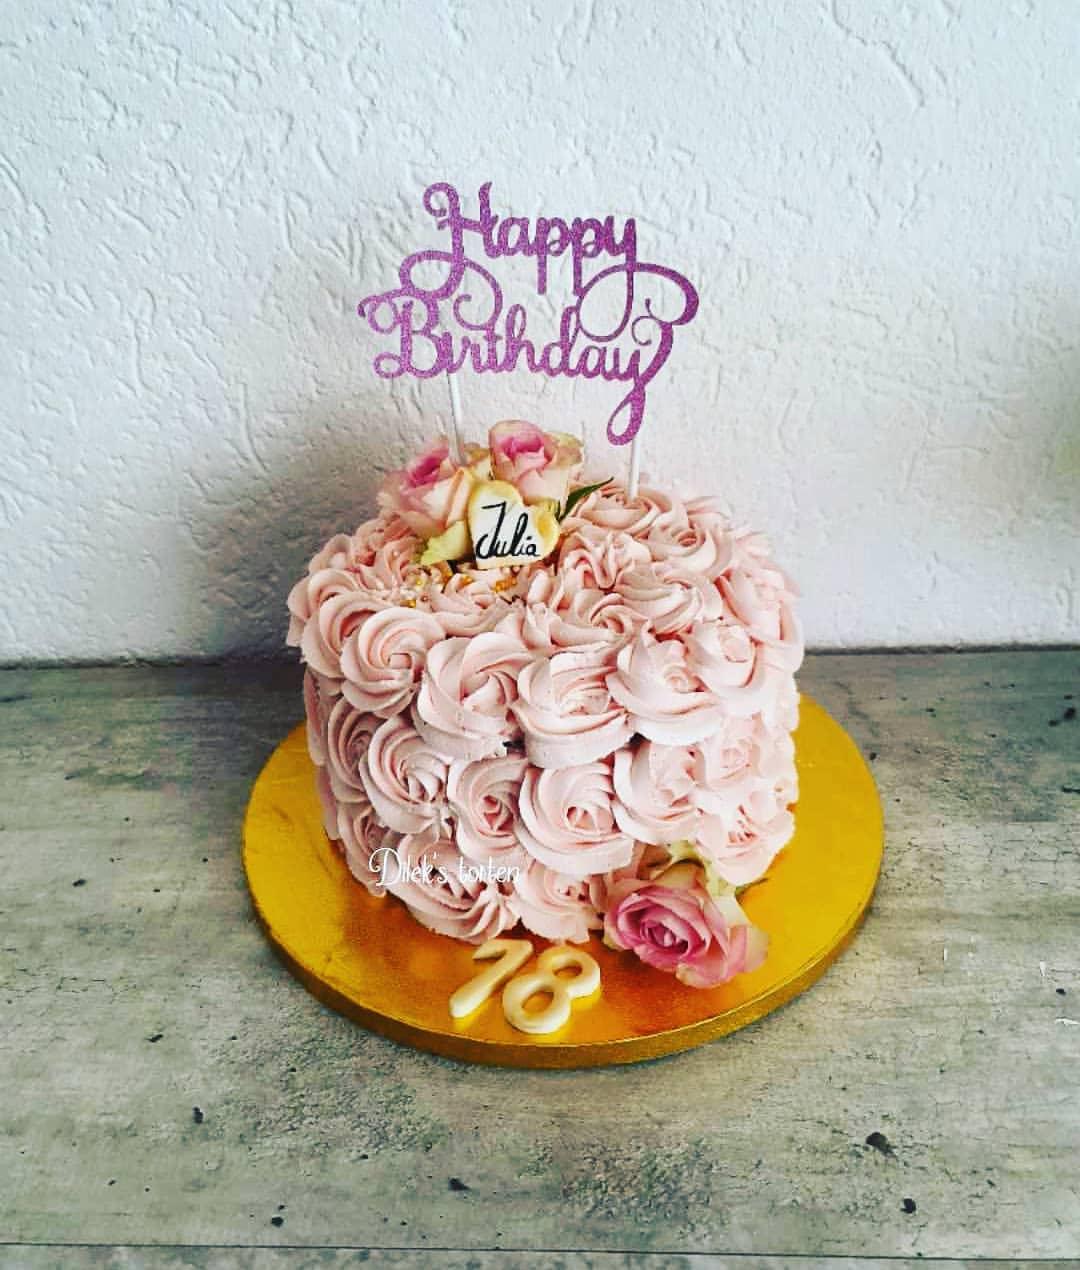 Tortendeko 1 Geburtstag Inspirierend Urime Ditlindje Balajrina 🤗 Flamingo Club Birthday